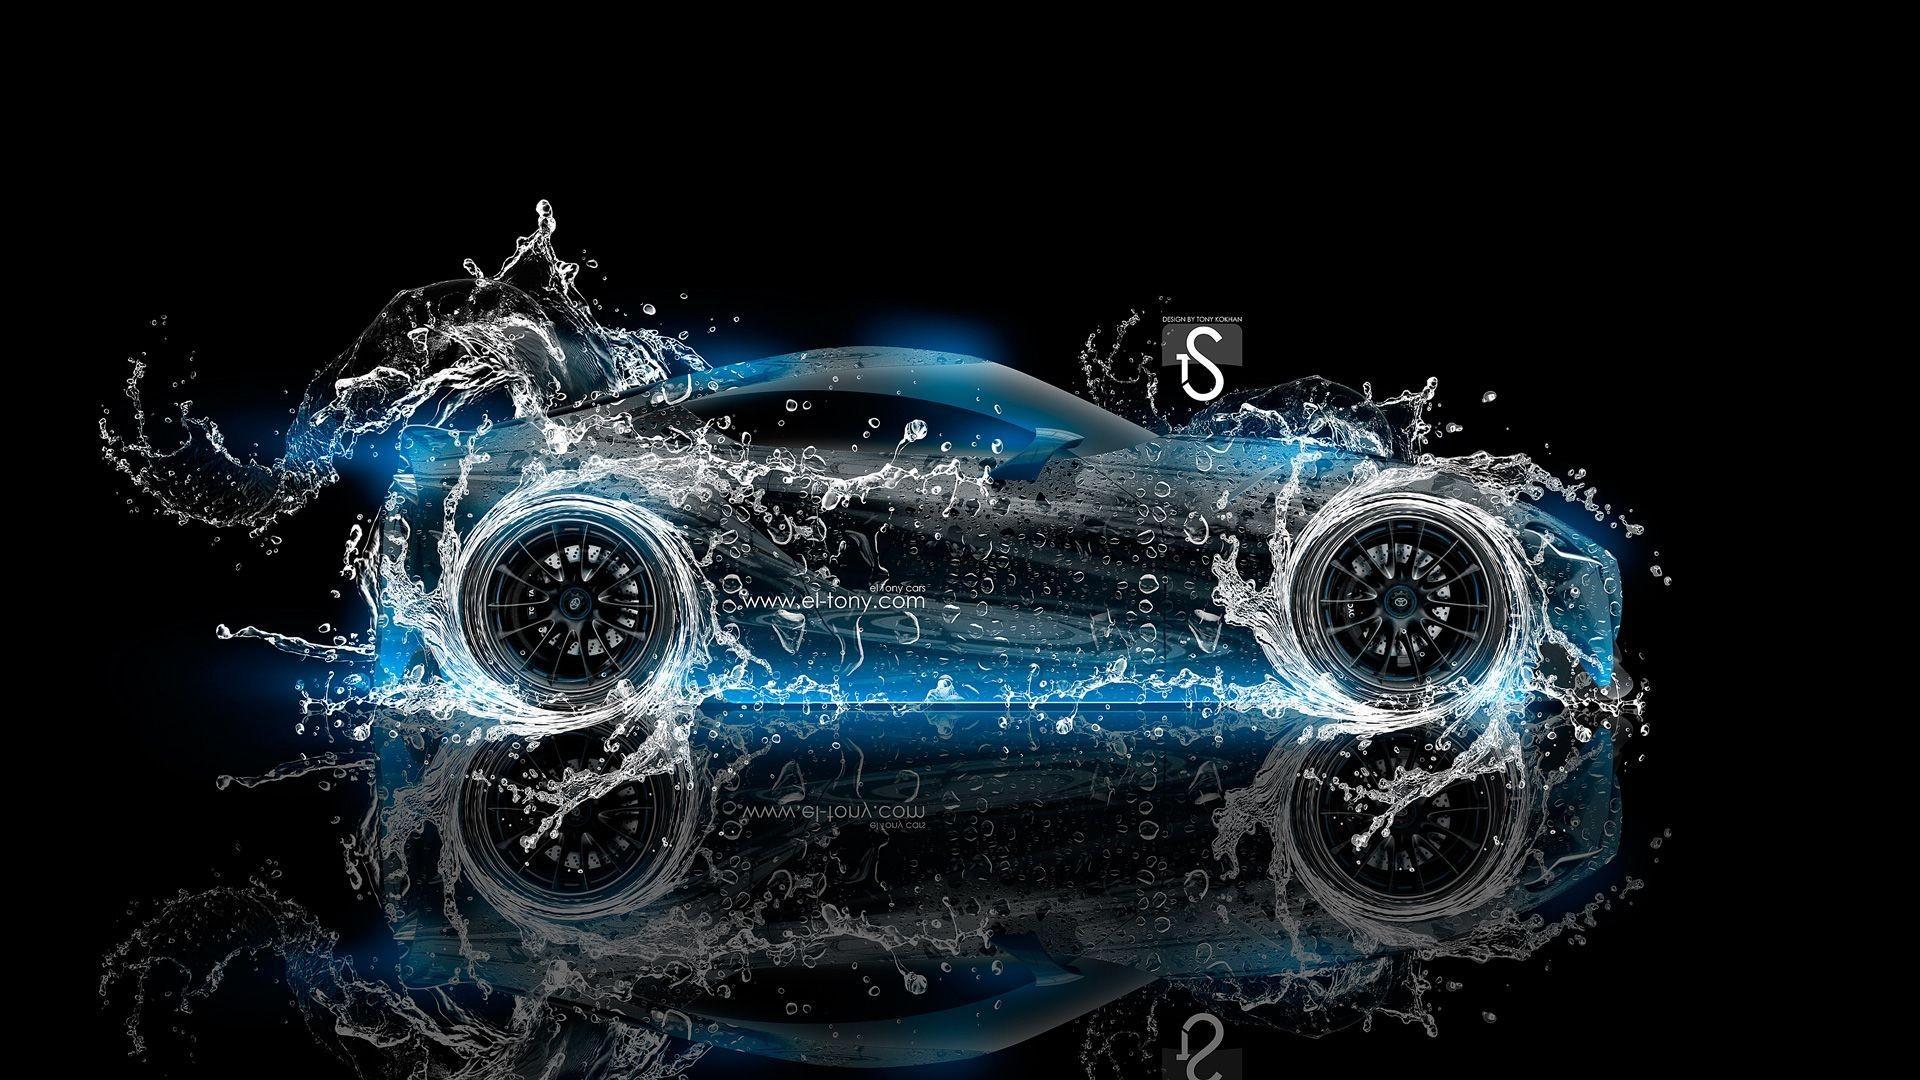 2014 Toyota FT-1 Water Blue Neon Wallpaper HD #12397 Wallpaper .